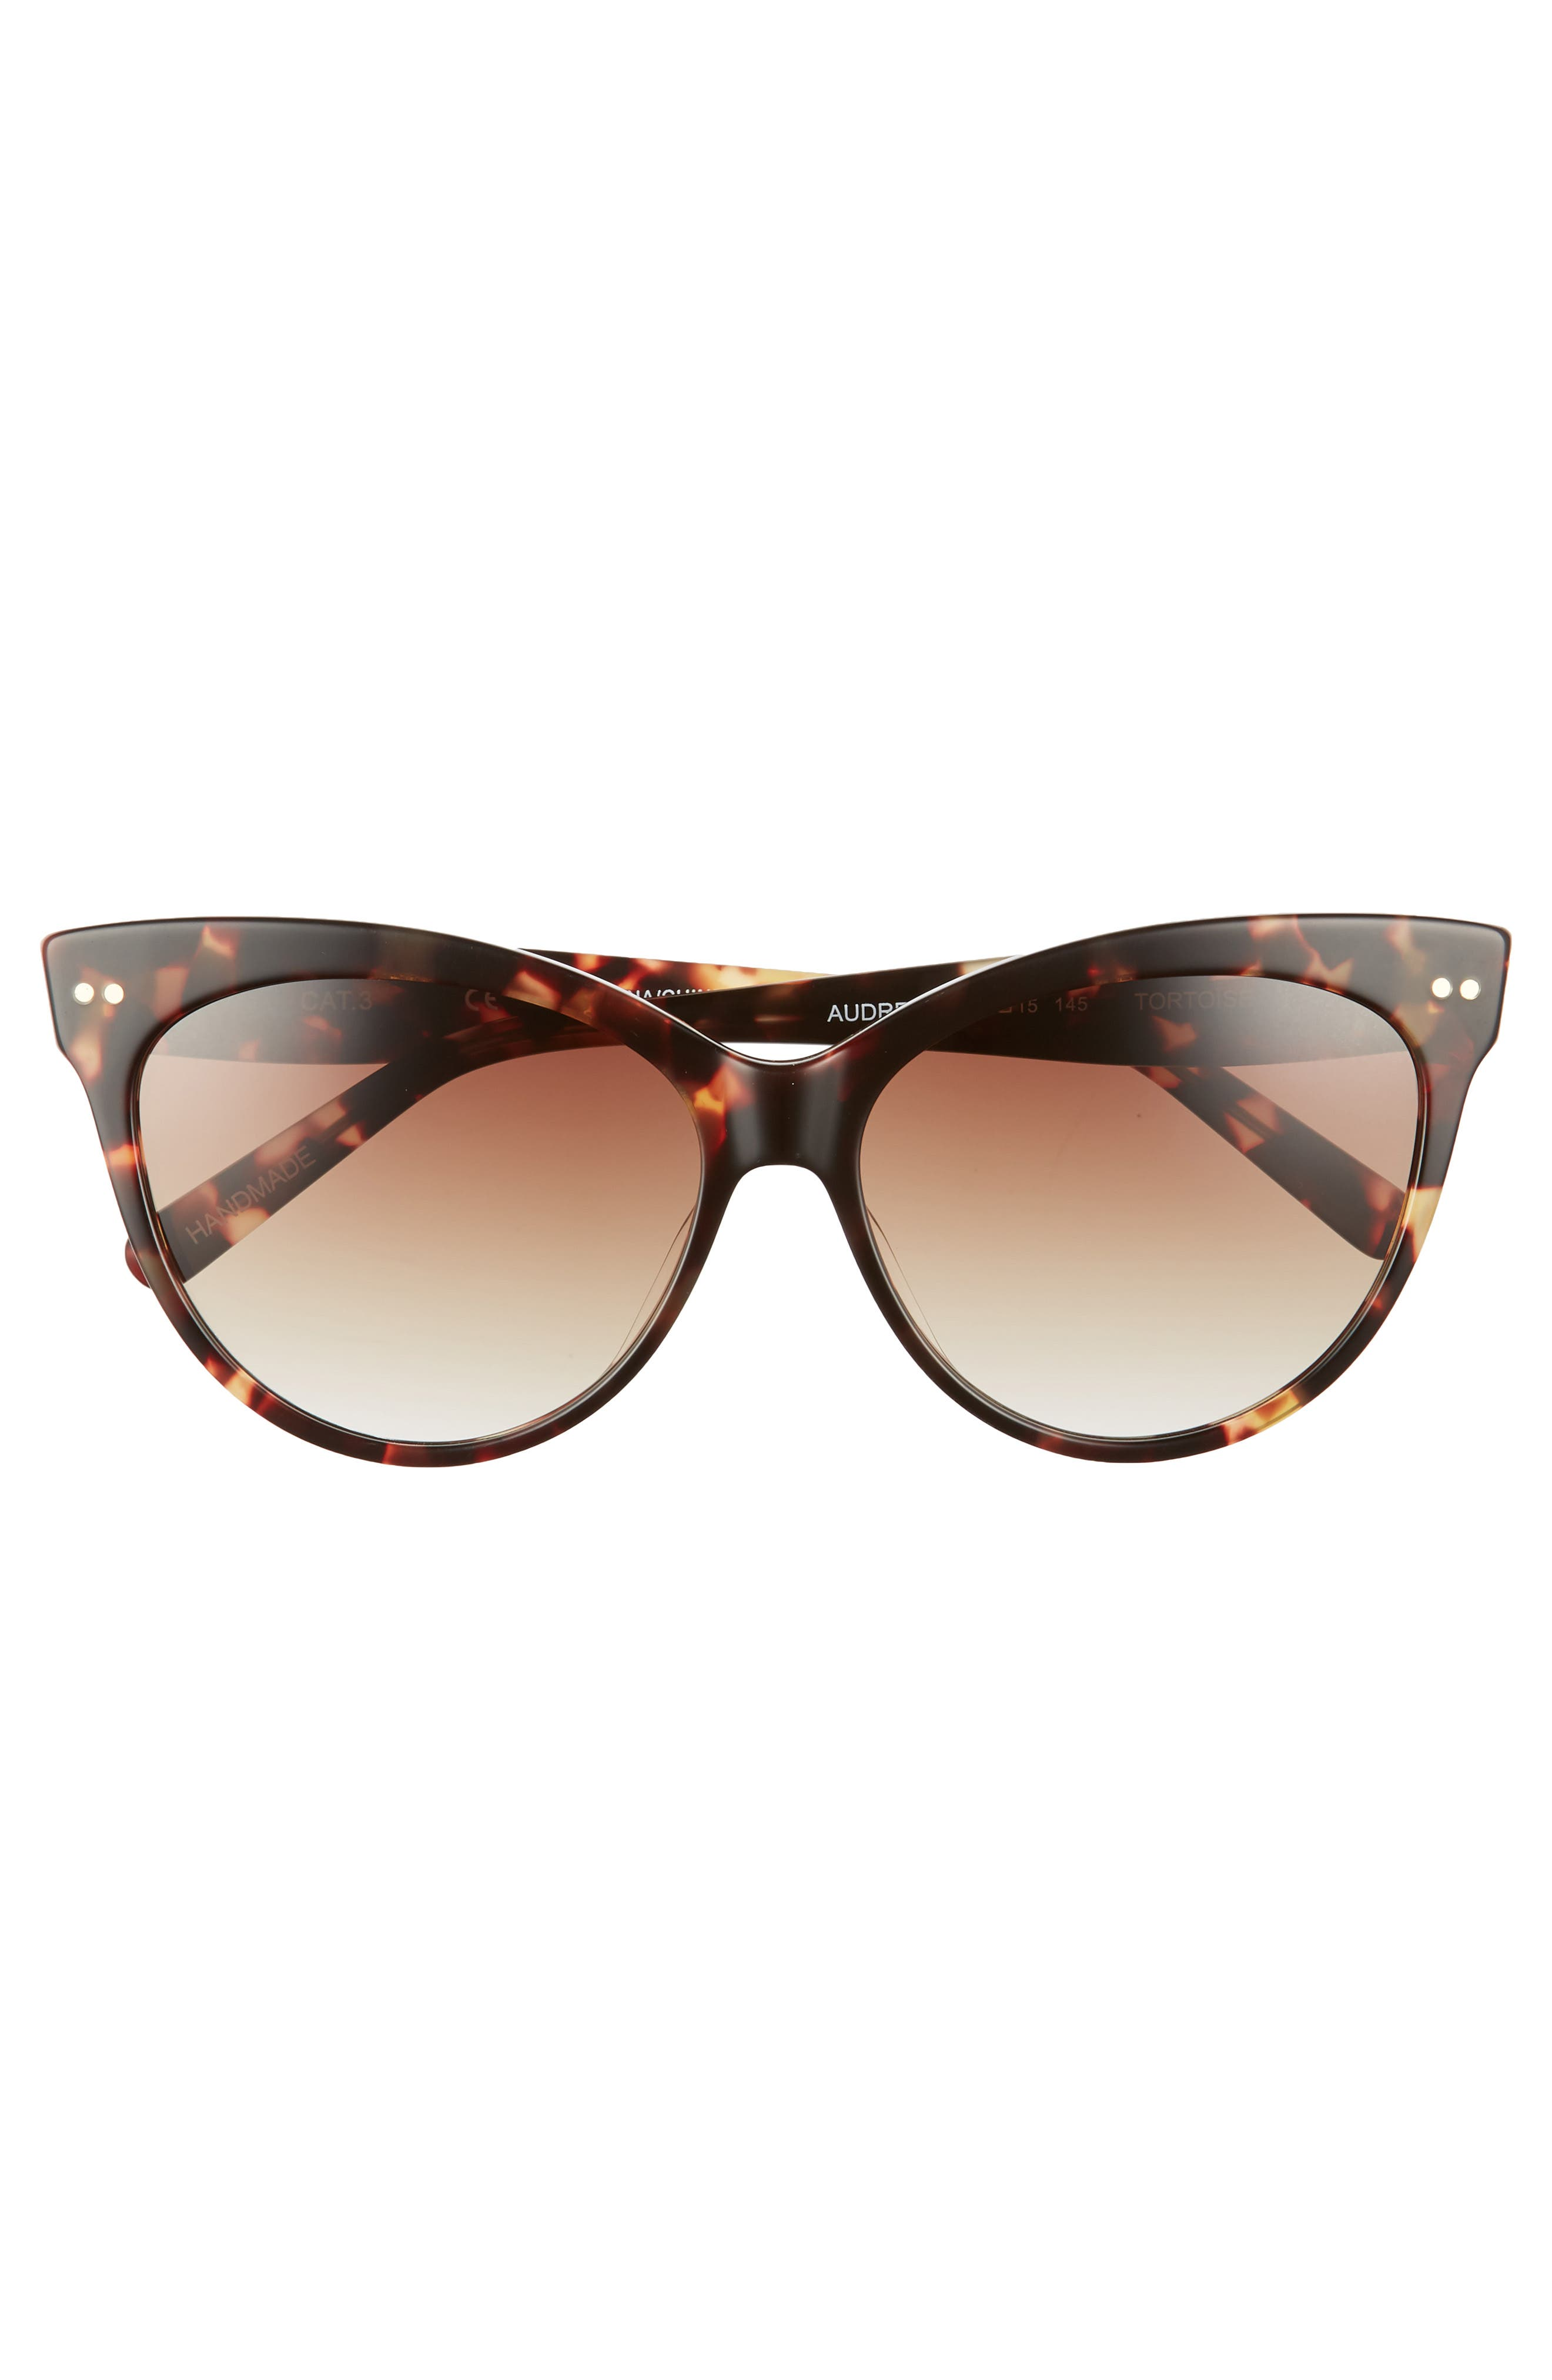 Audrey 60mm Cat Eye Sunglasses,                             Alternate thumbnail 3, color,                             Brown Tortoise